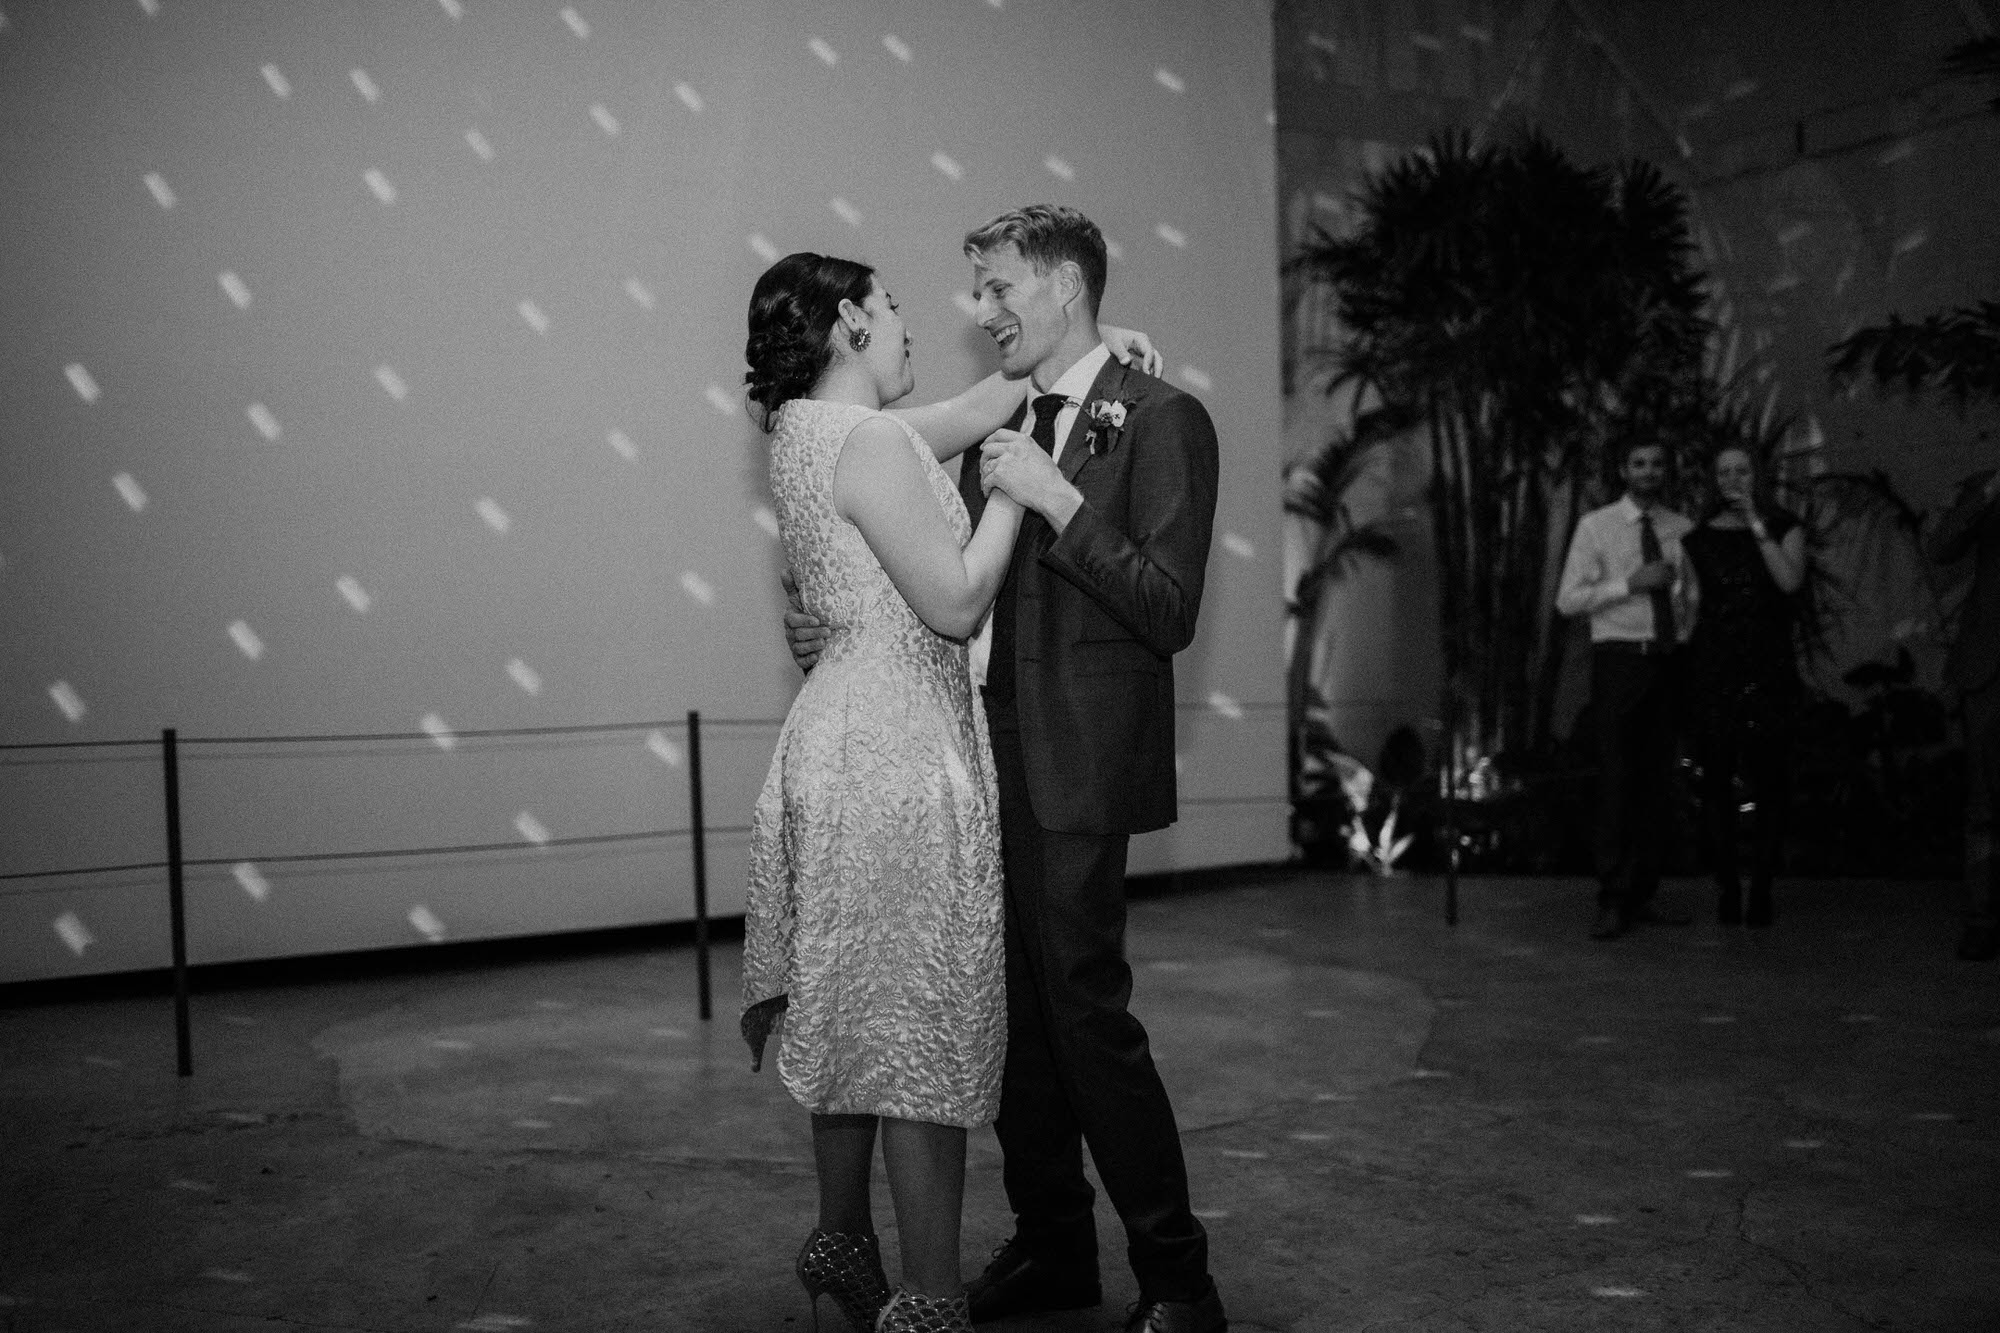 los-angeles-wedding-photographer-millwick-122.jpg